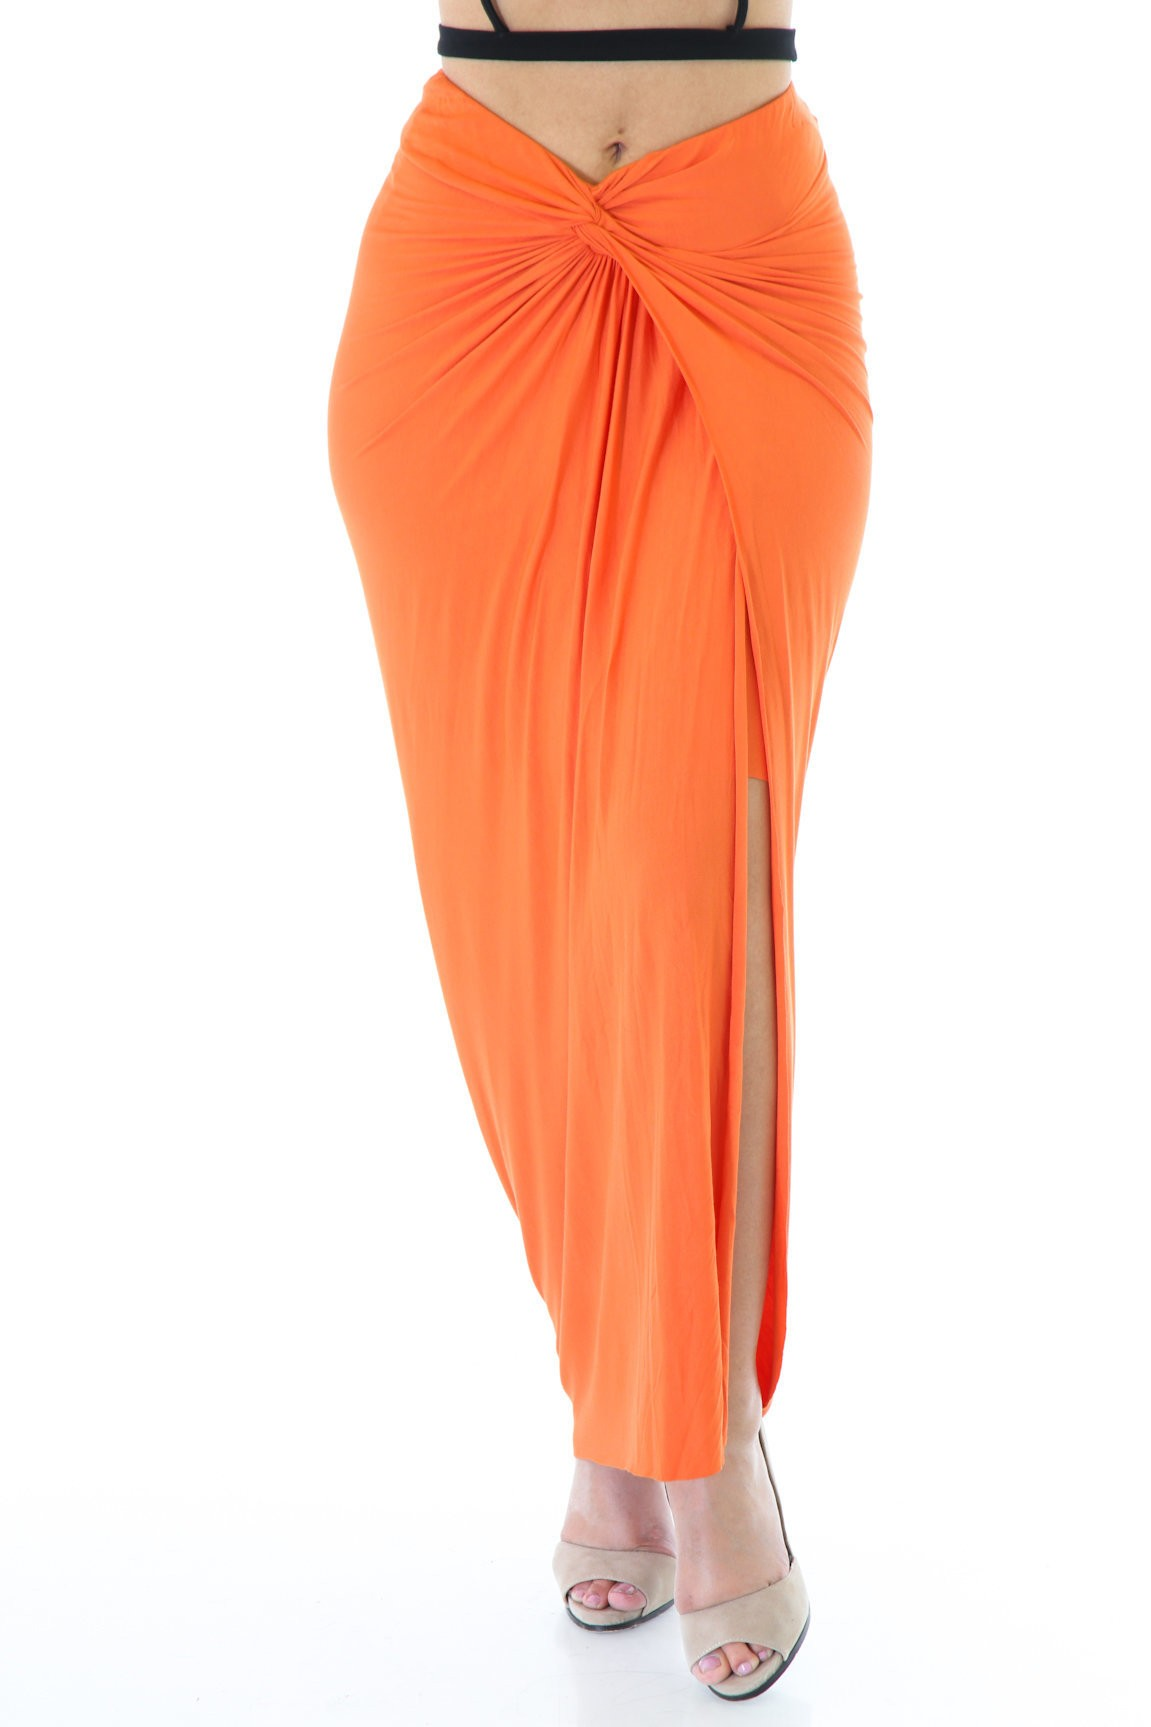 Norm Overlay Maxi Skirt